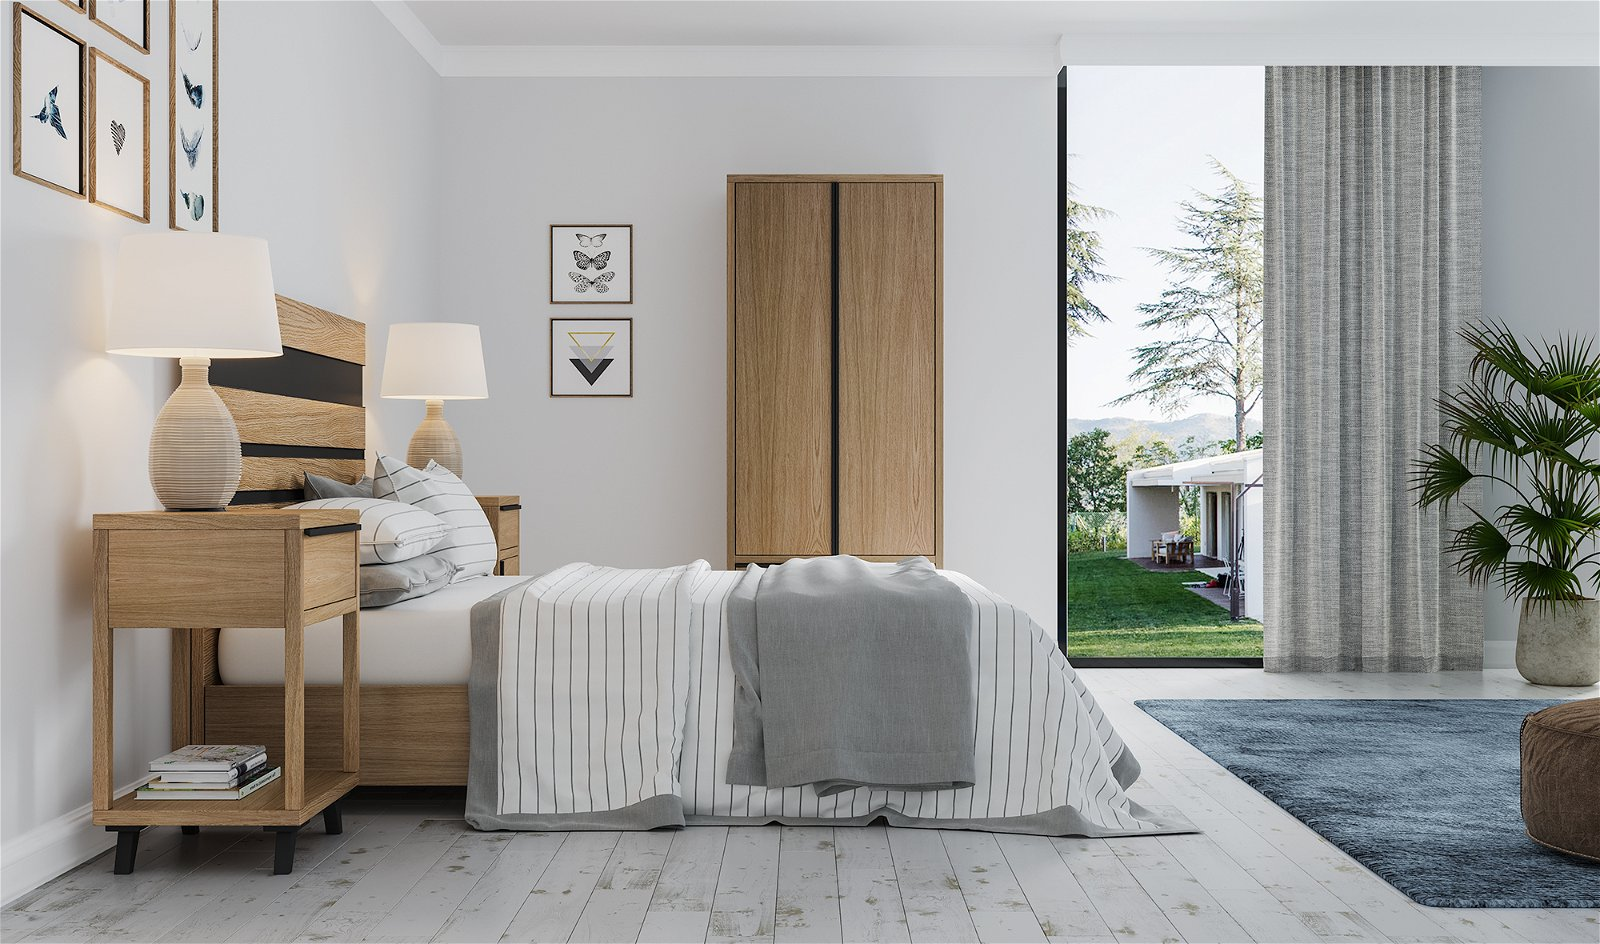 Dormitorio nórdico Borgen